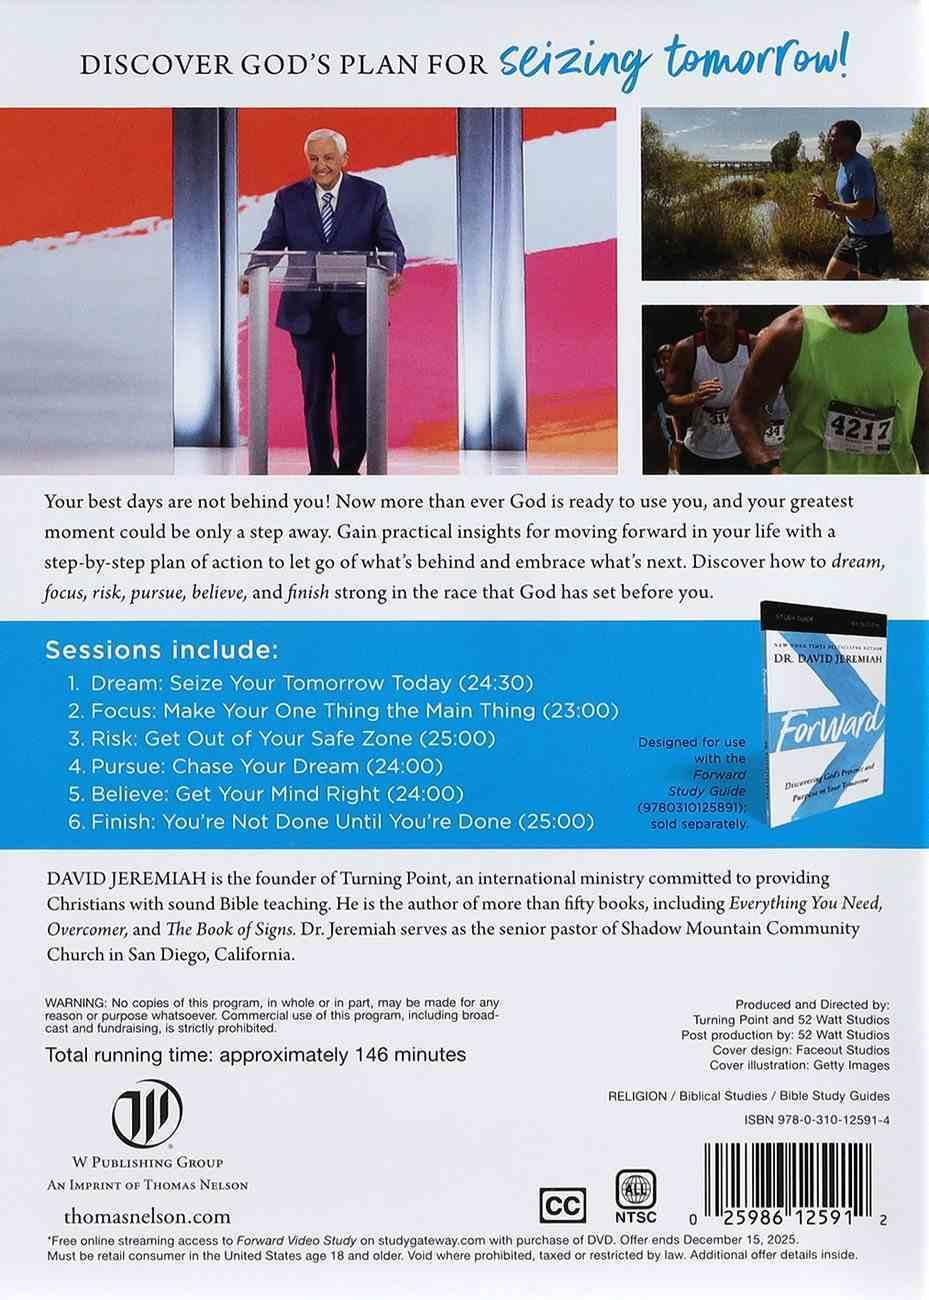 Forward DVD (Video Study) DVD